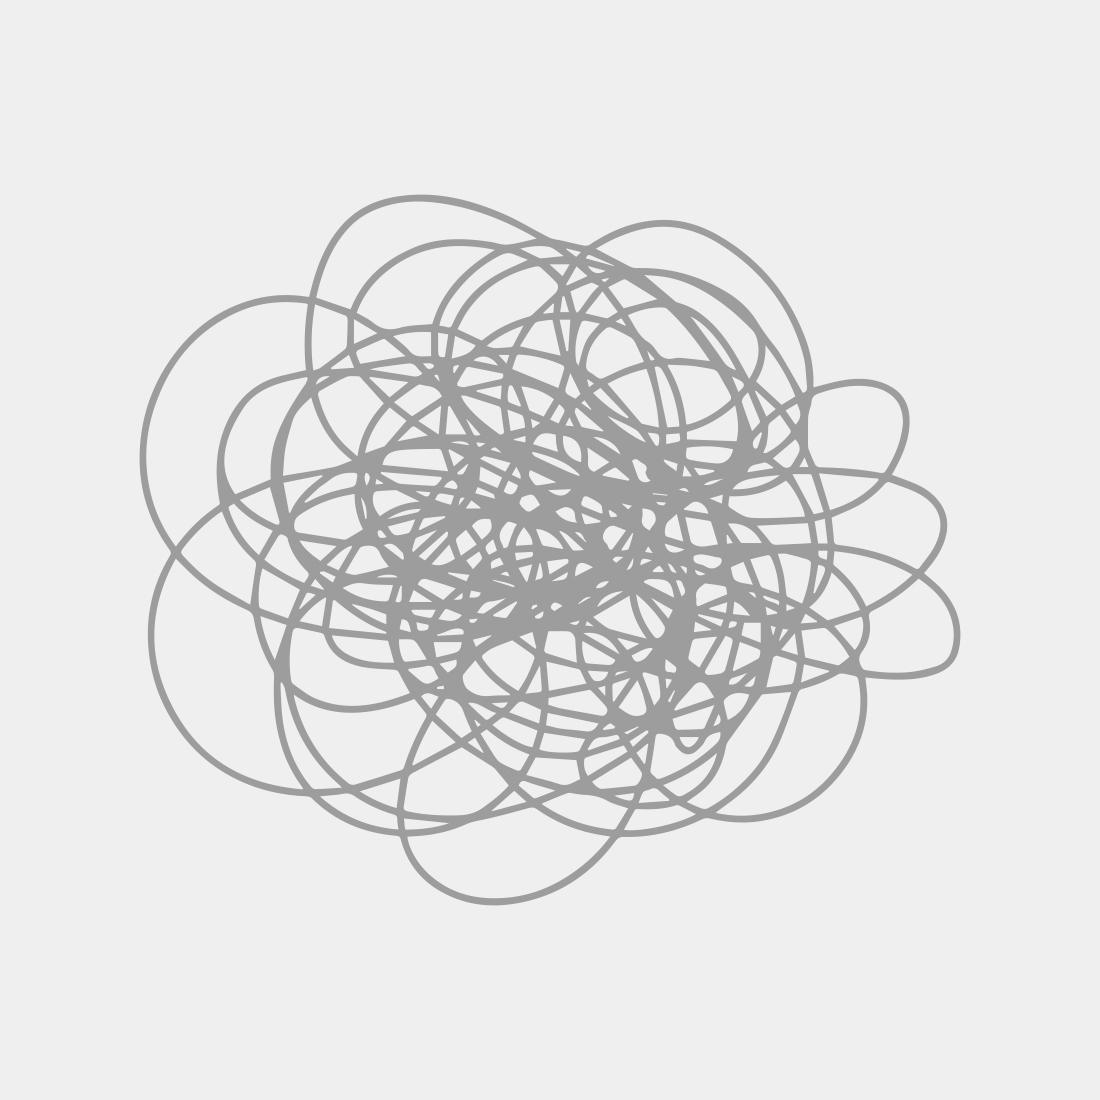 Large Print Oscar Murillo 'Manifestation'